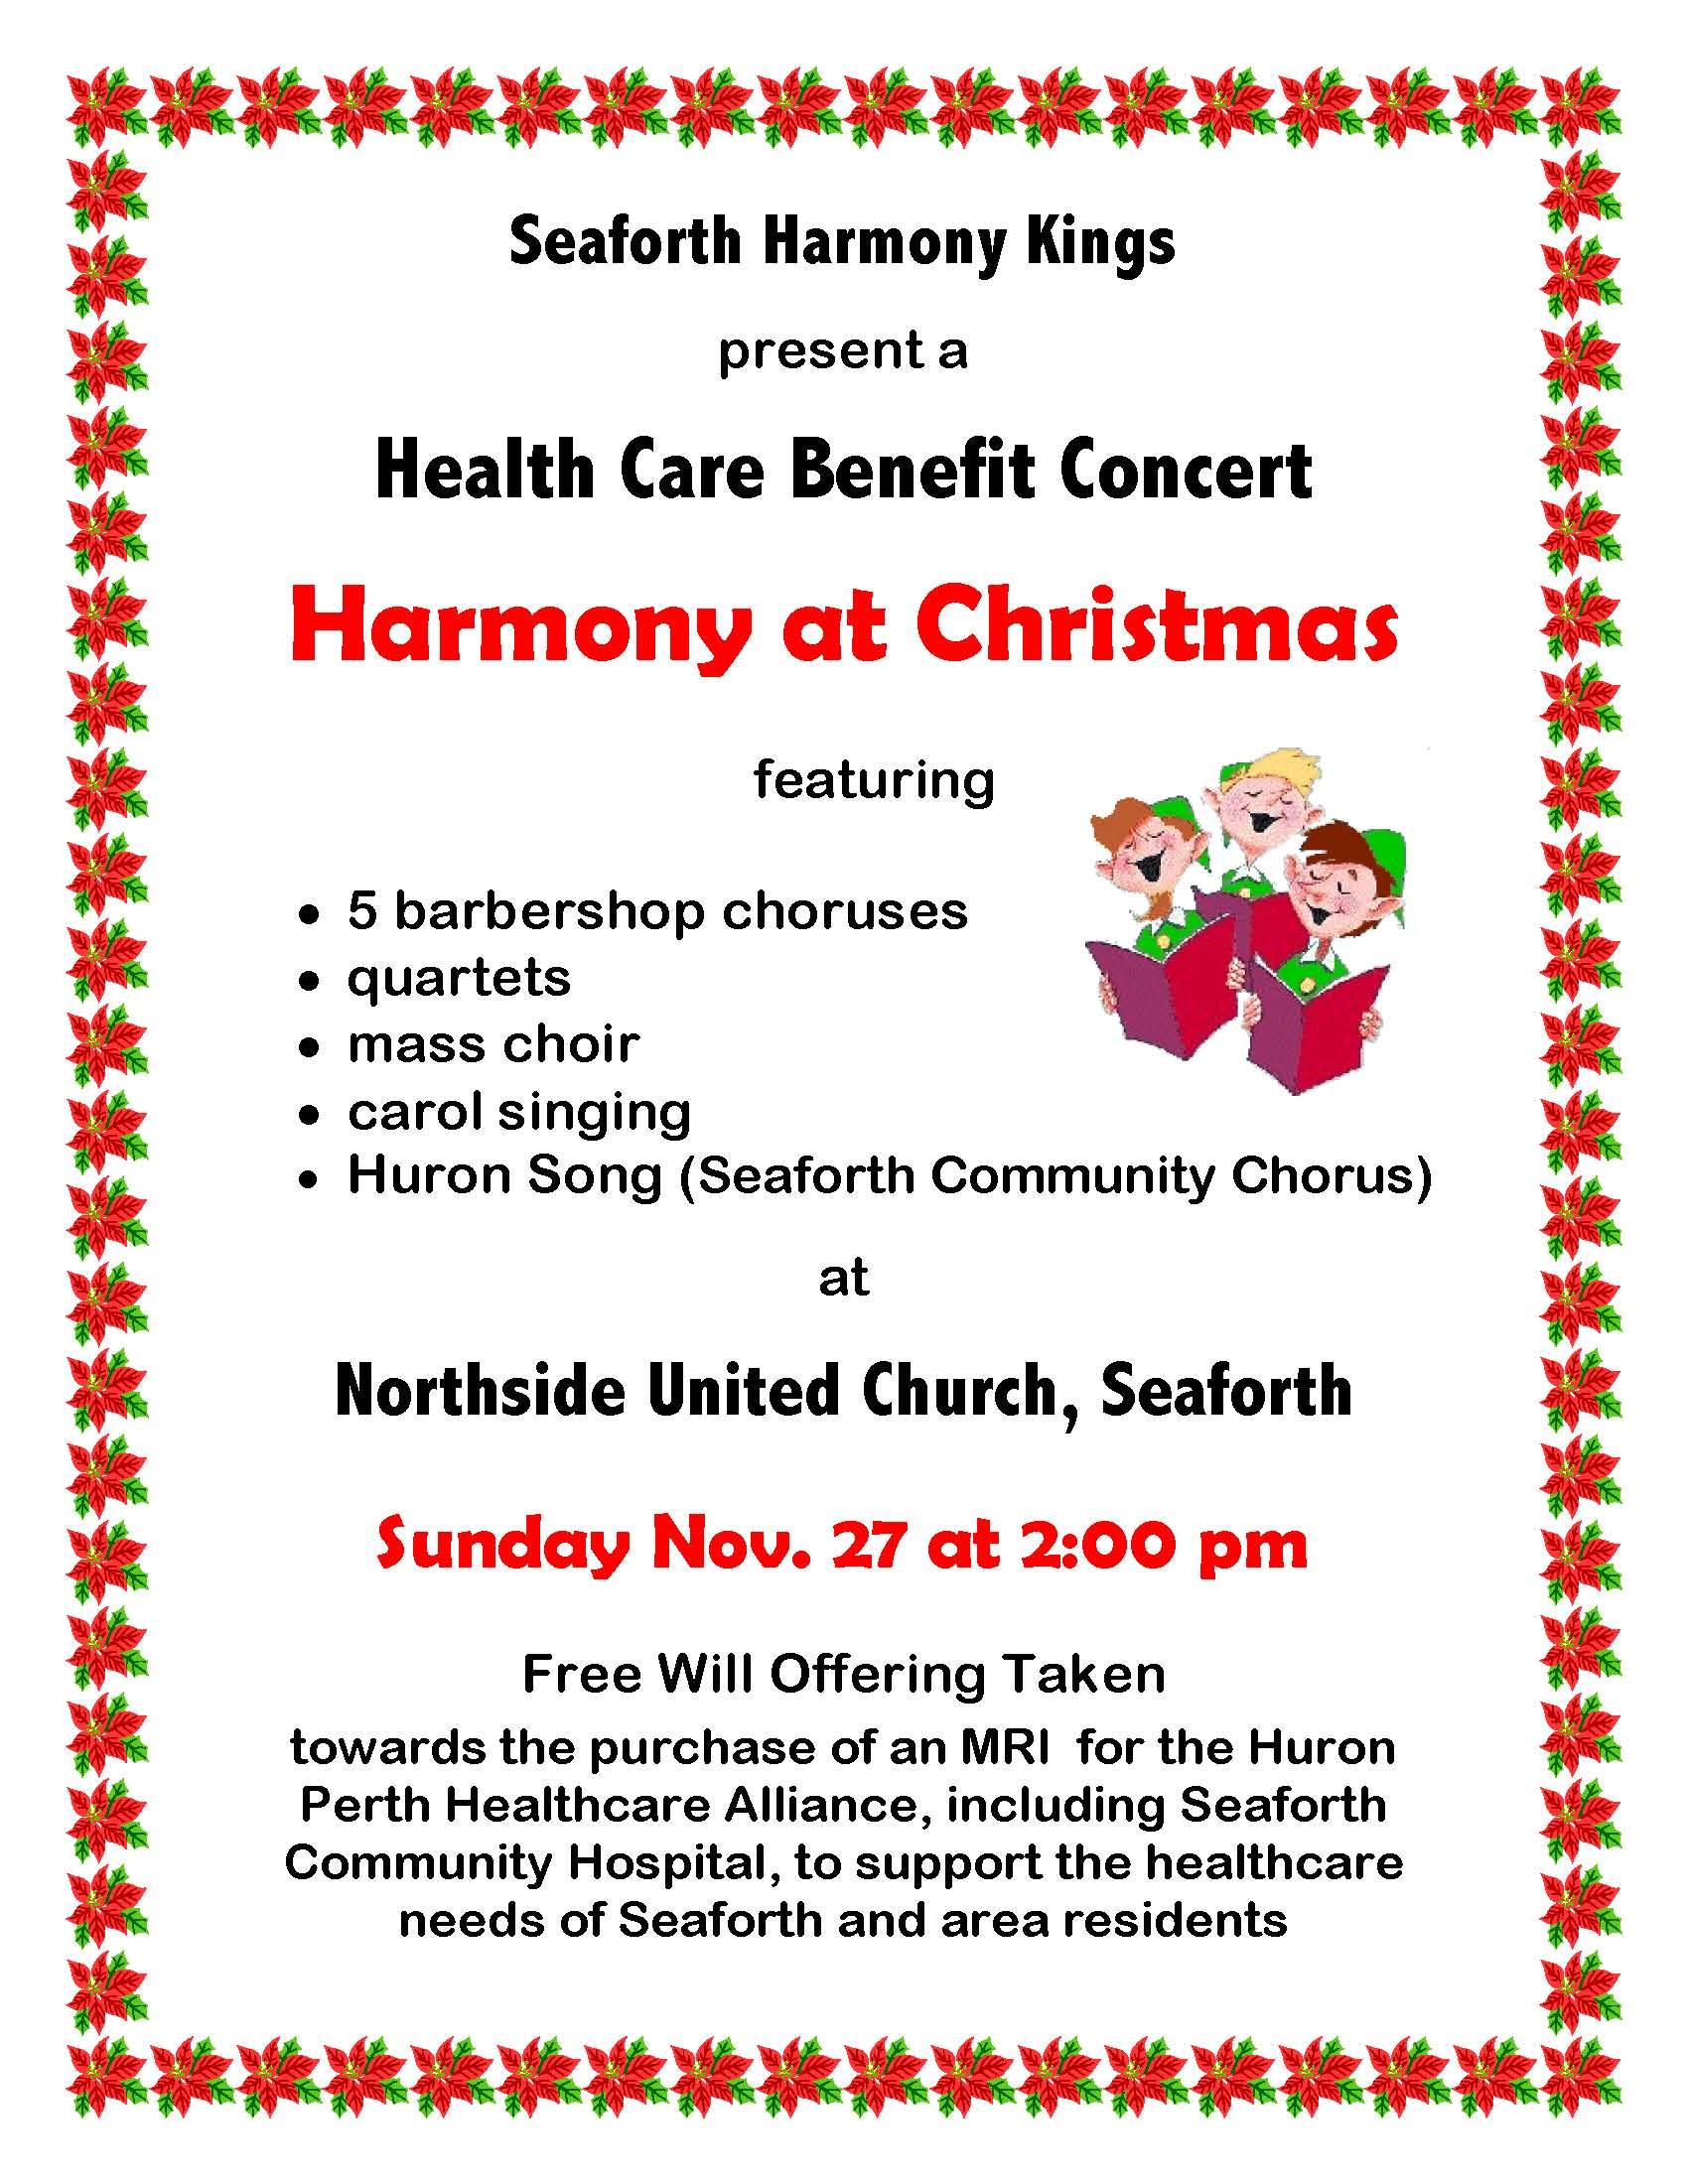 d7fbe-harmony_at_christmas_poster_2011.jpg